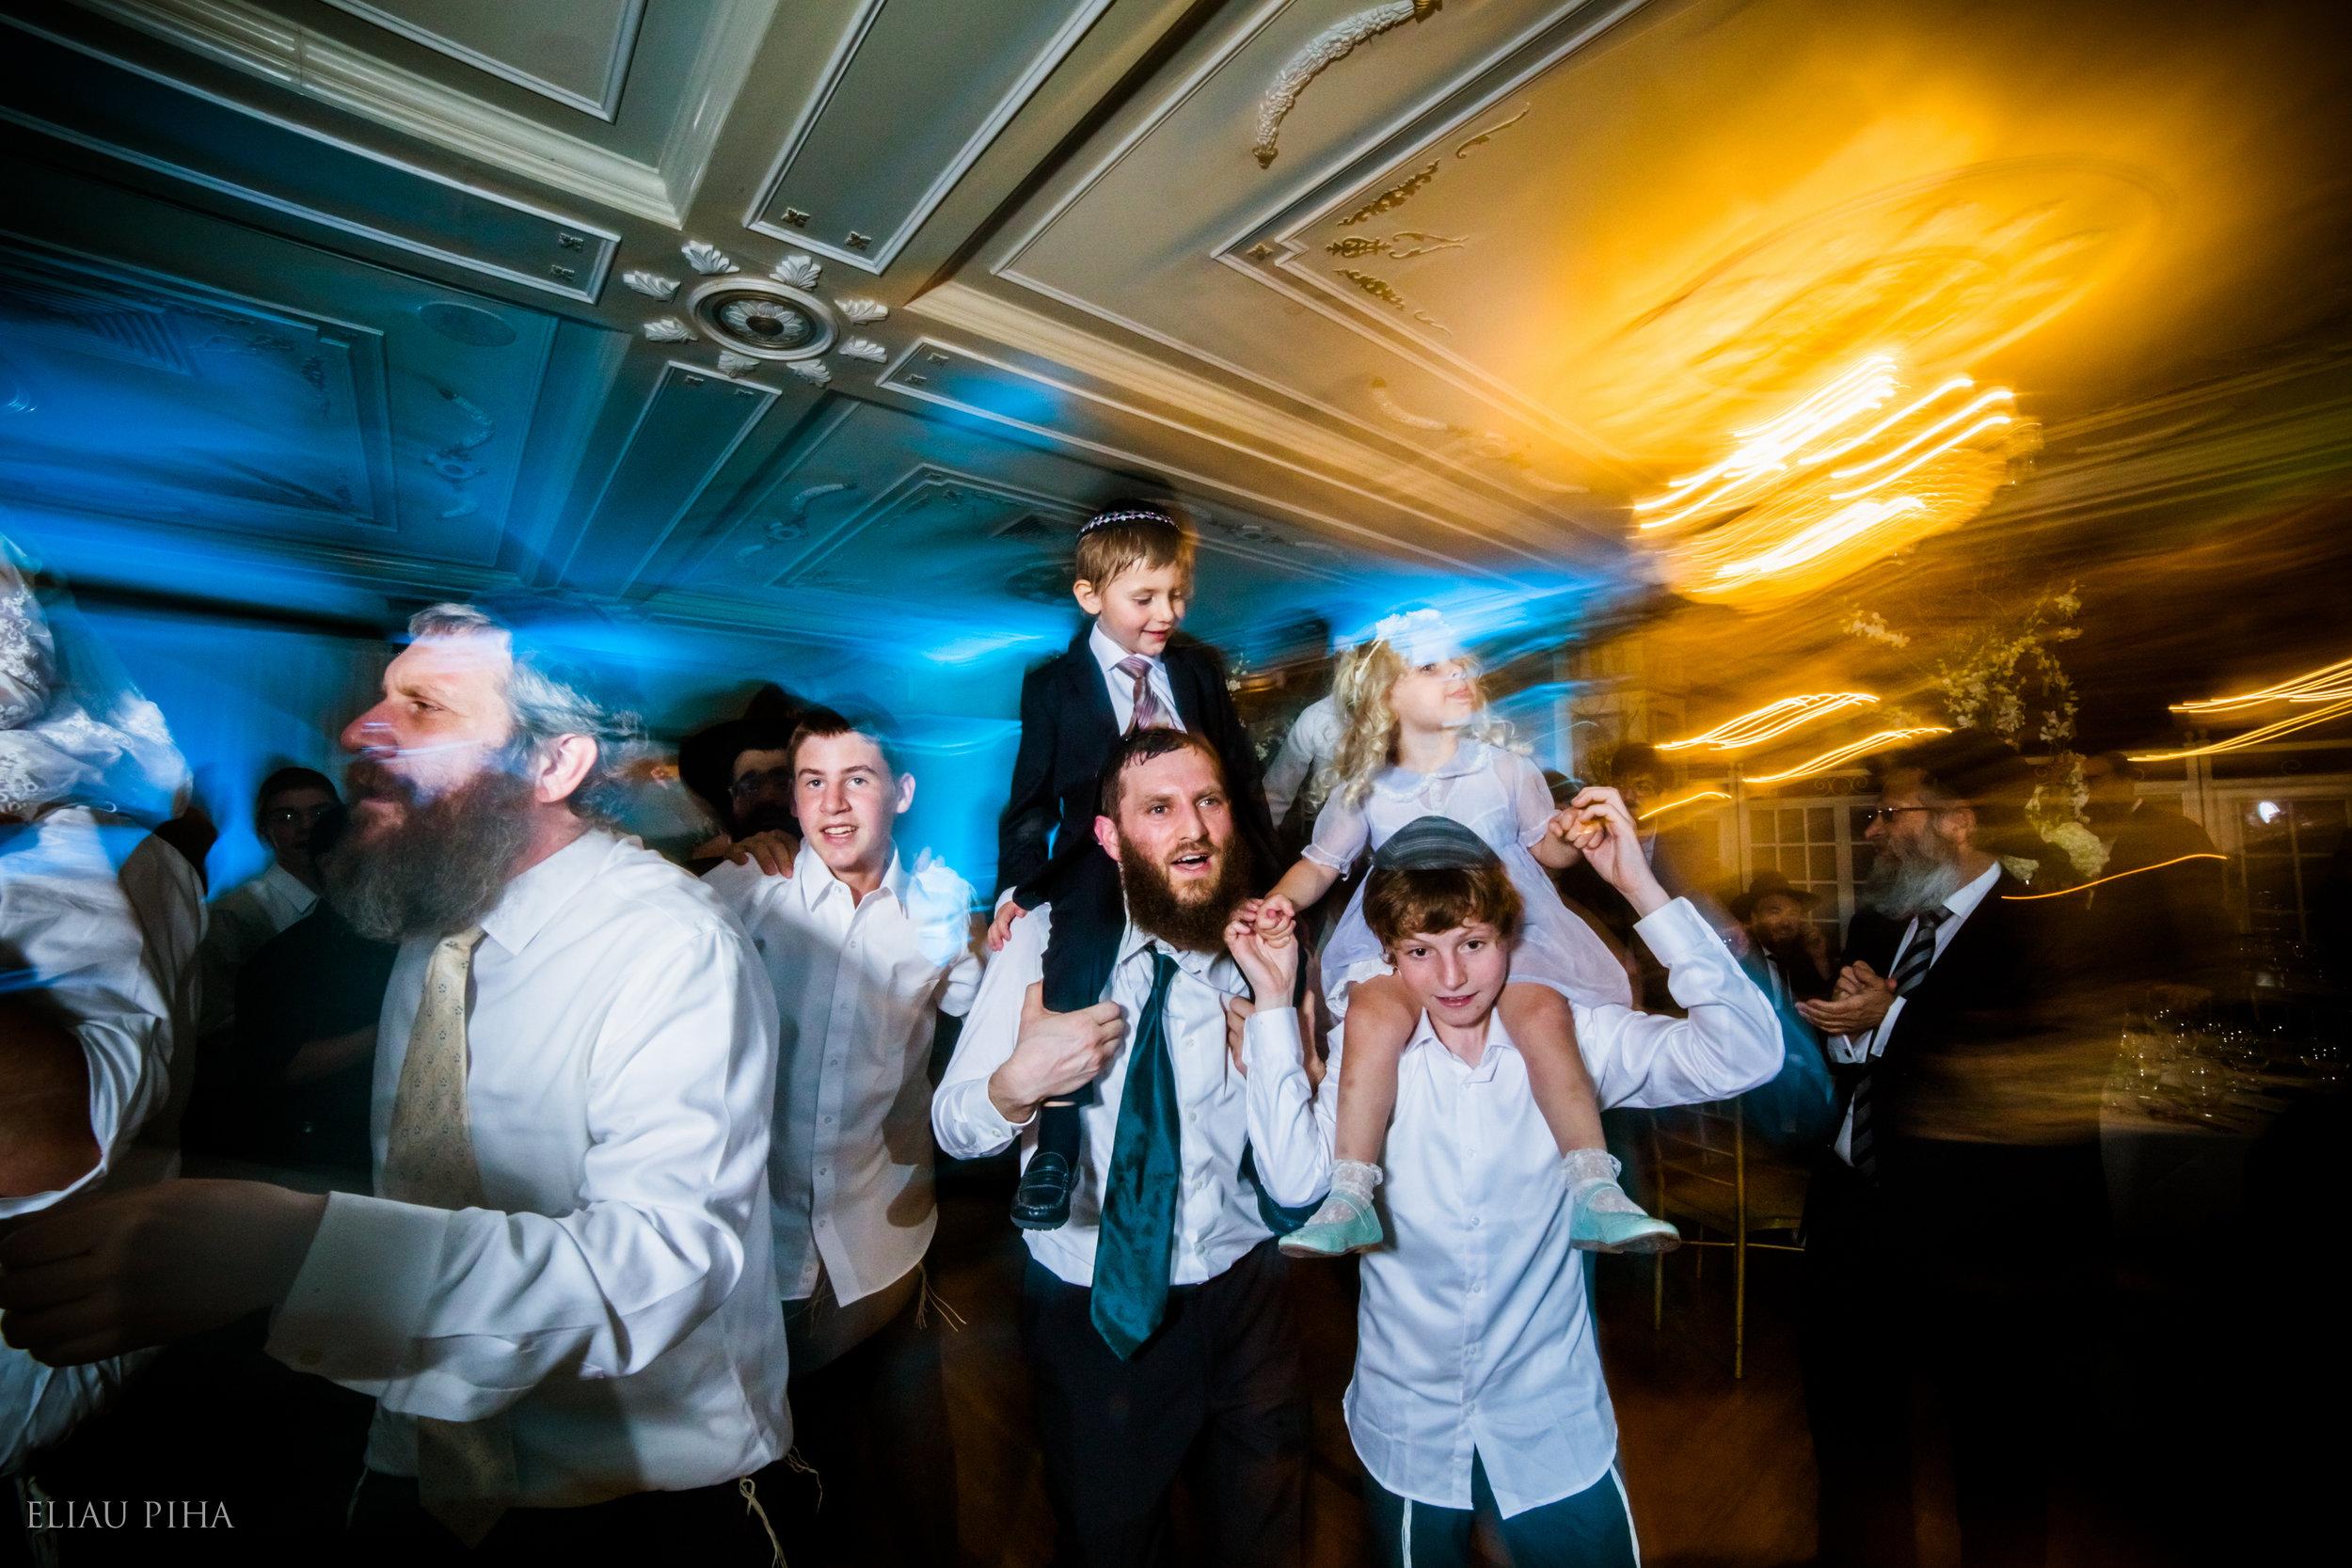 Bar Mitzvah Meir Sandman - photography, new york, events, people -0450.jpg